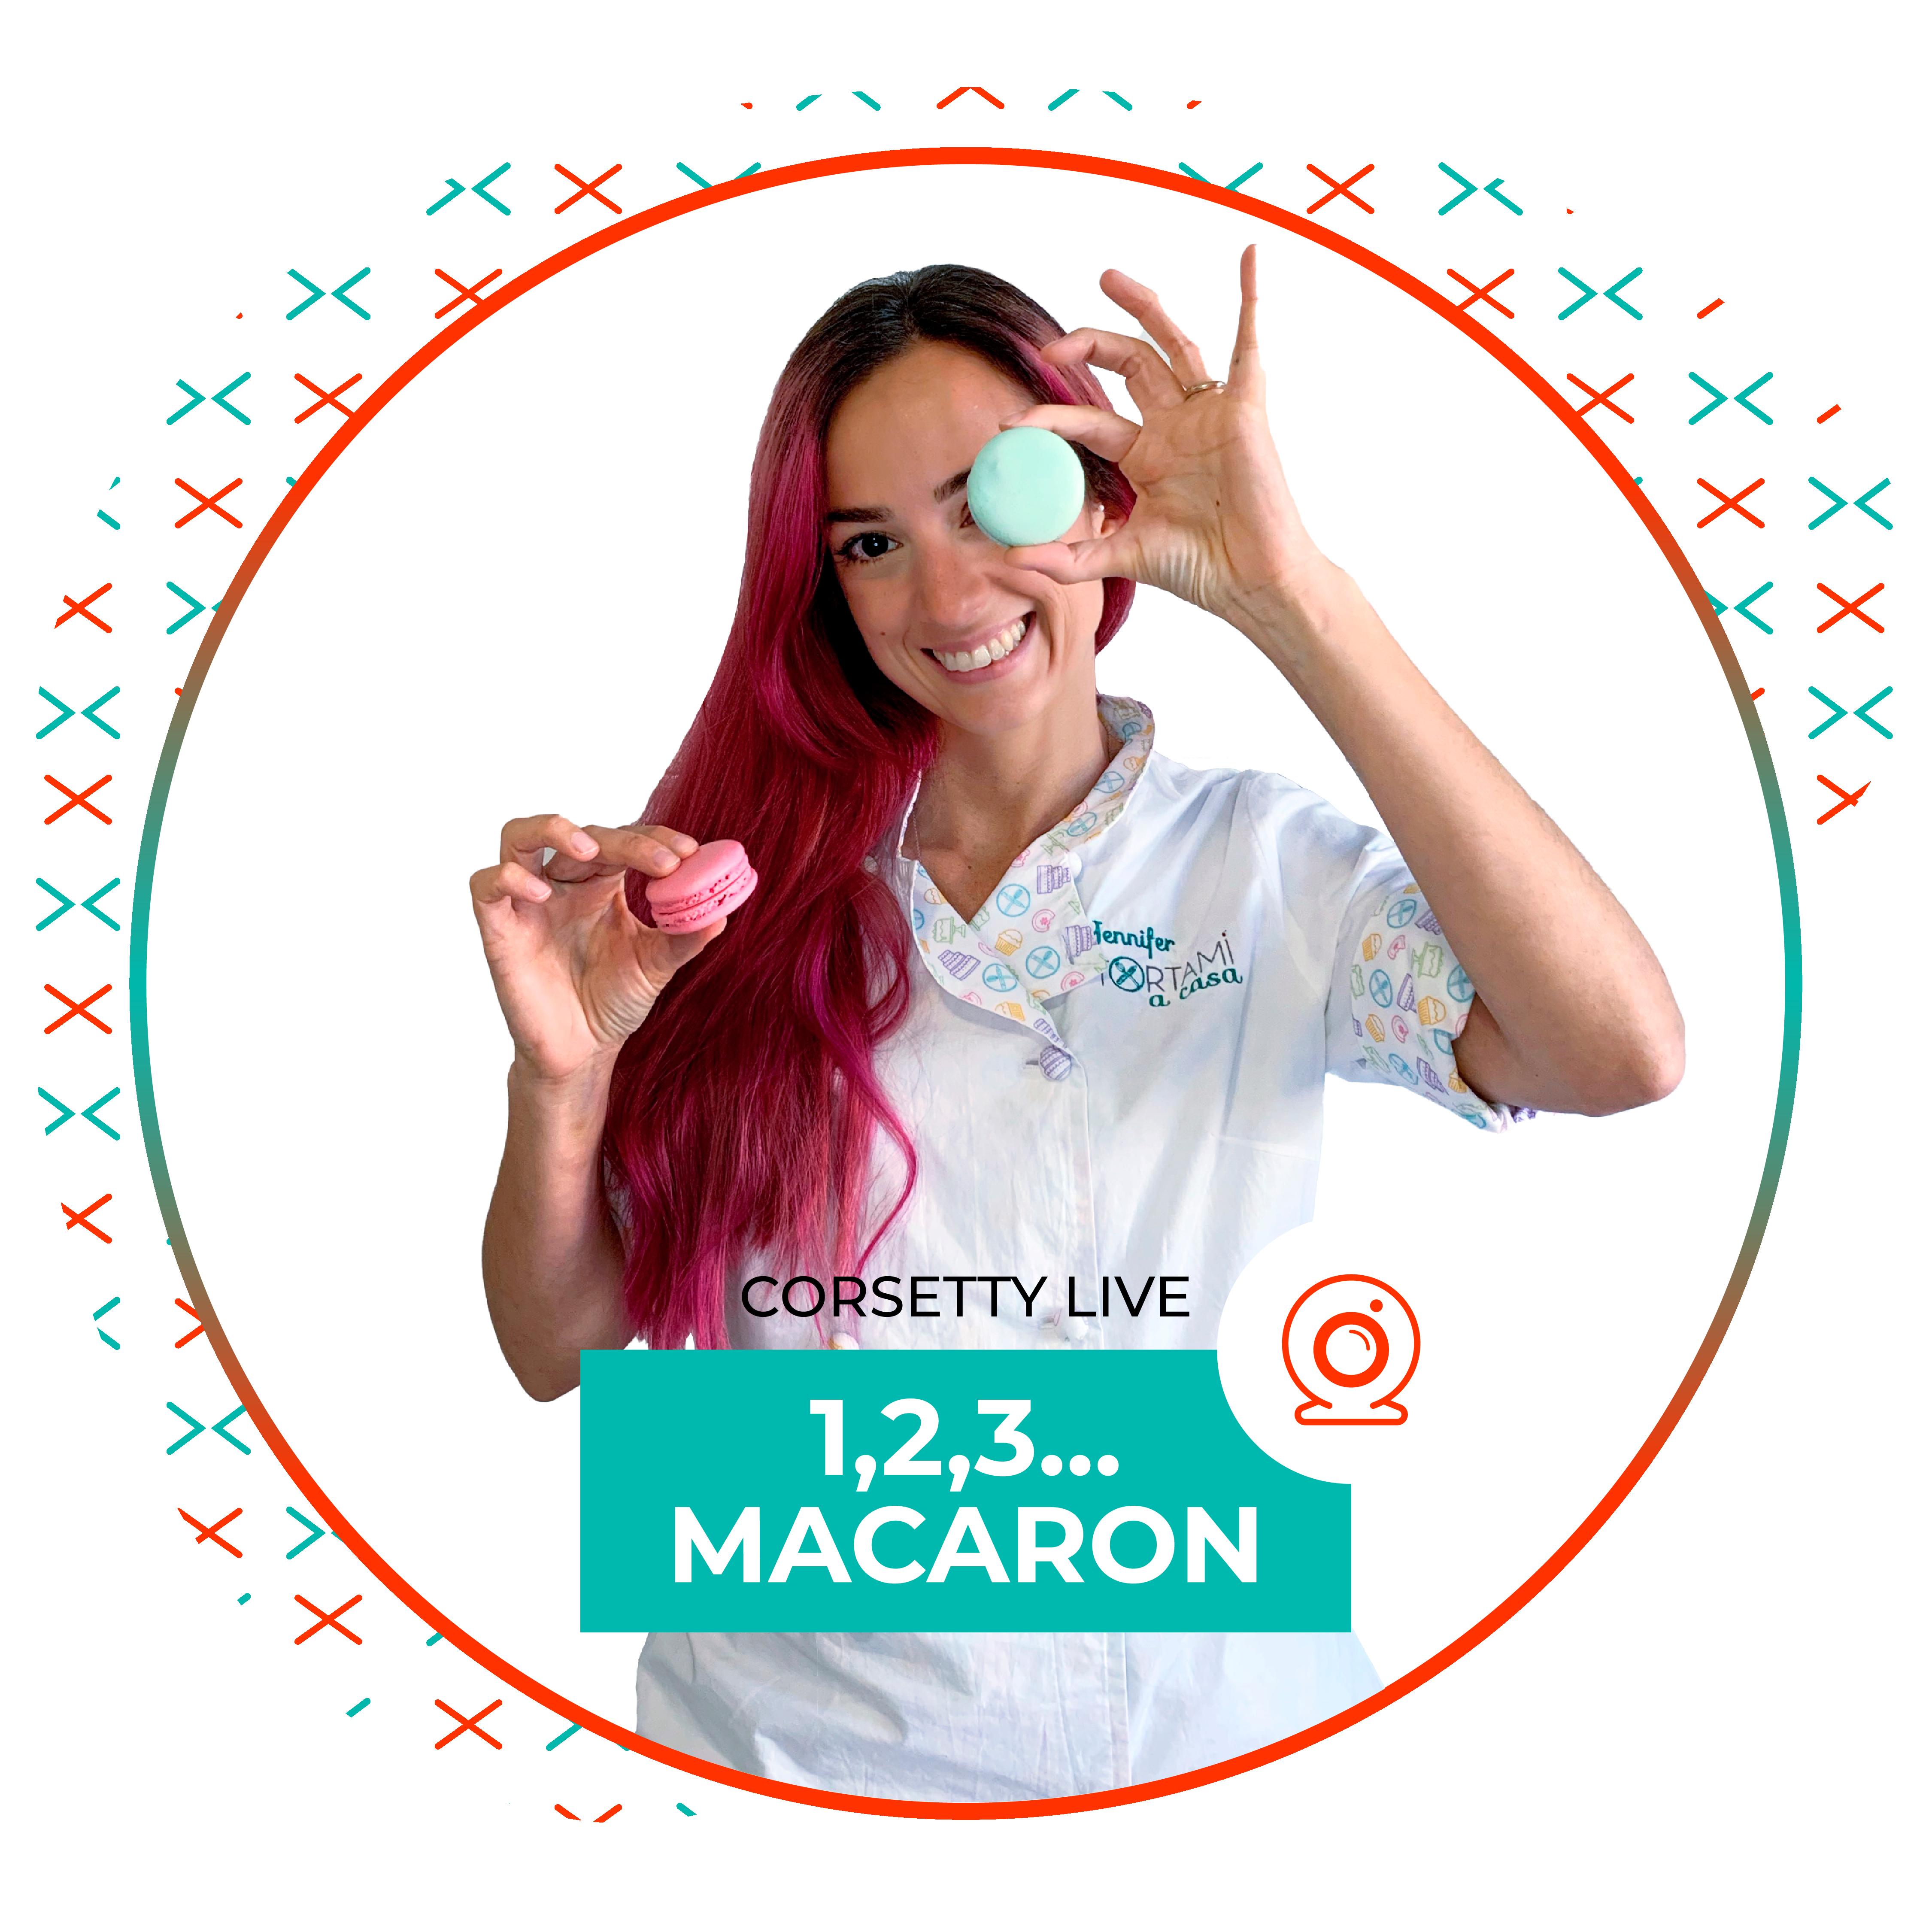 Corsetty – live: 1,2,3…macaron!